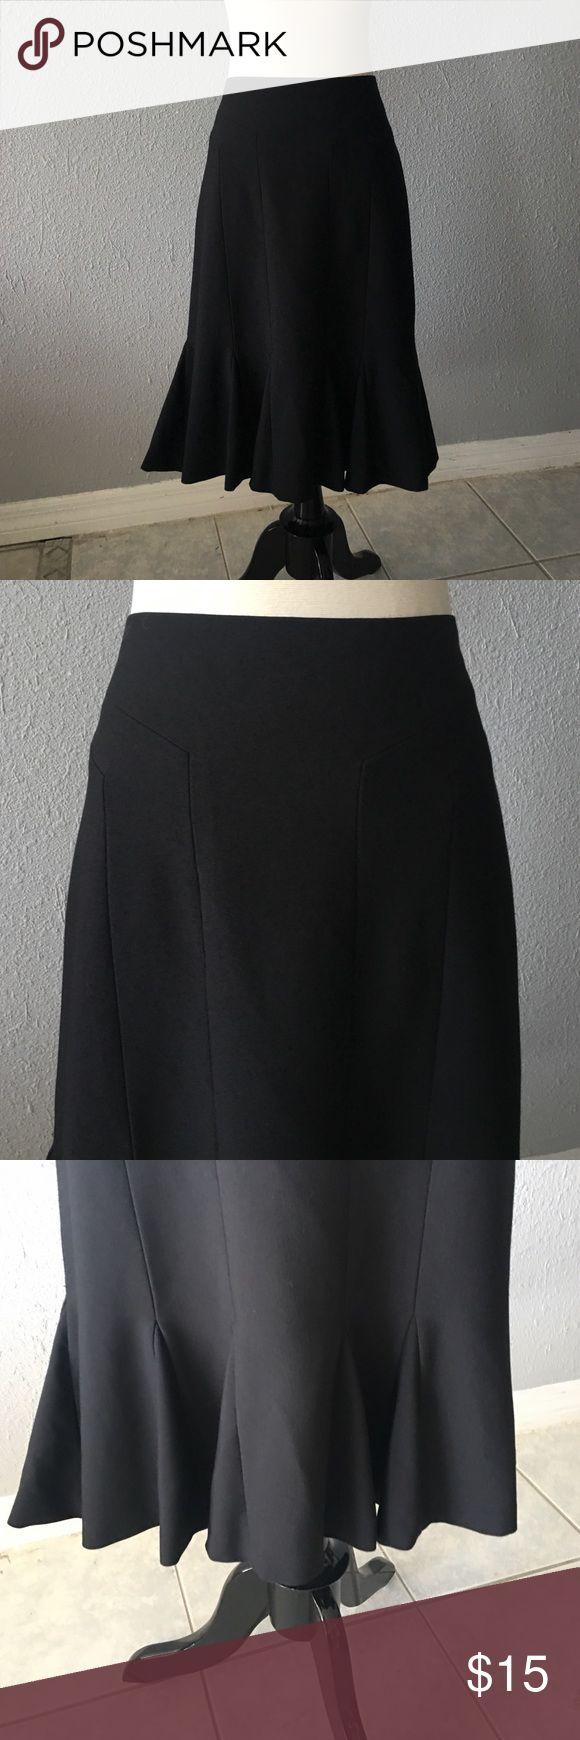 Black Midi Skirt In excellent condition! RW&CO. Skirts Midi